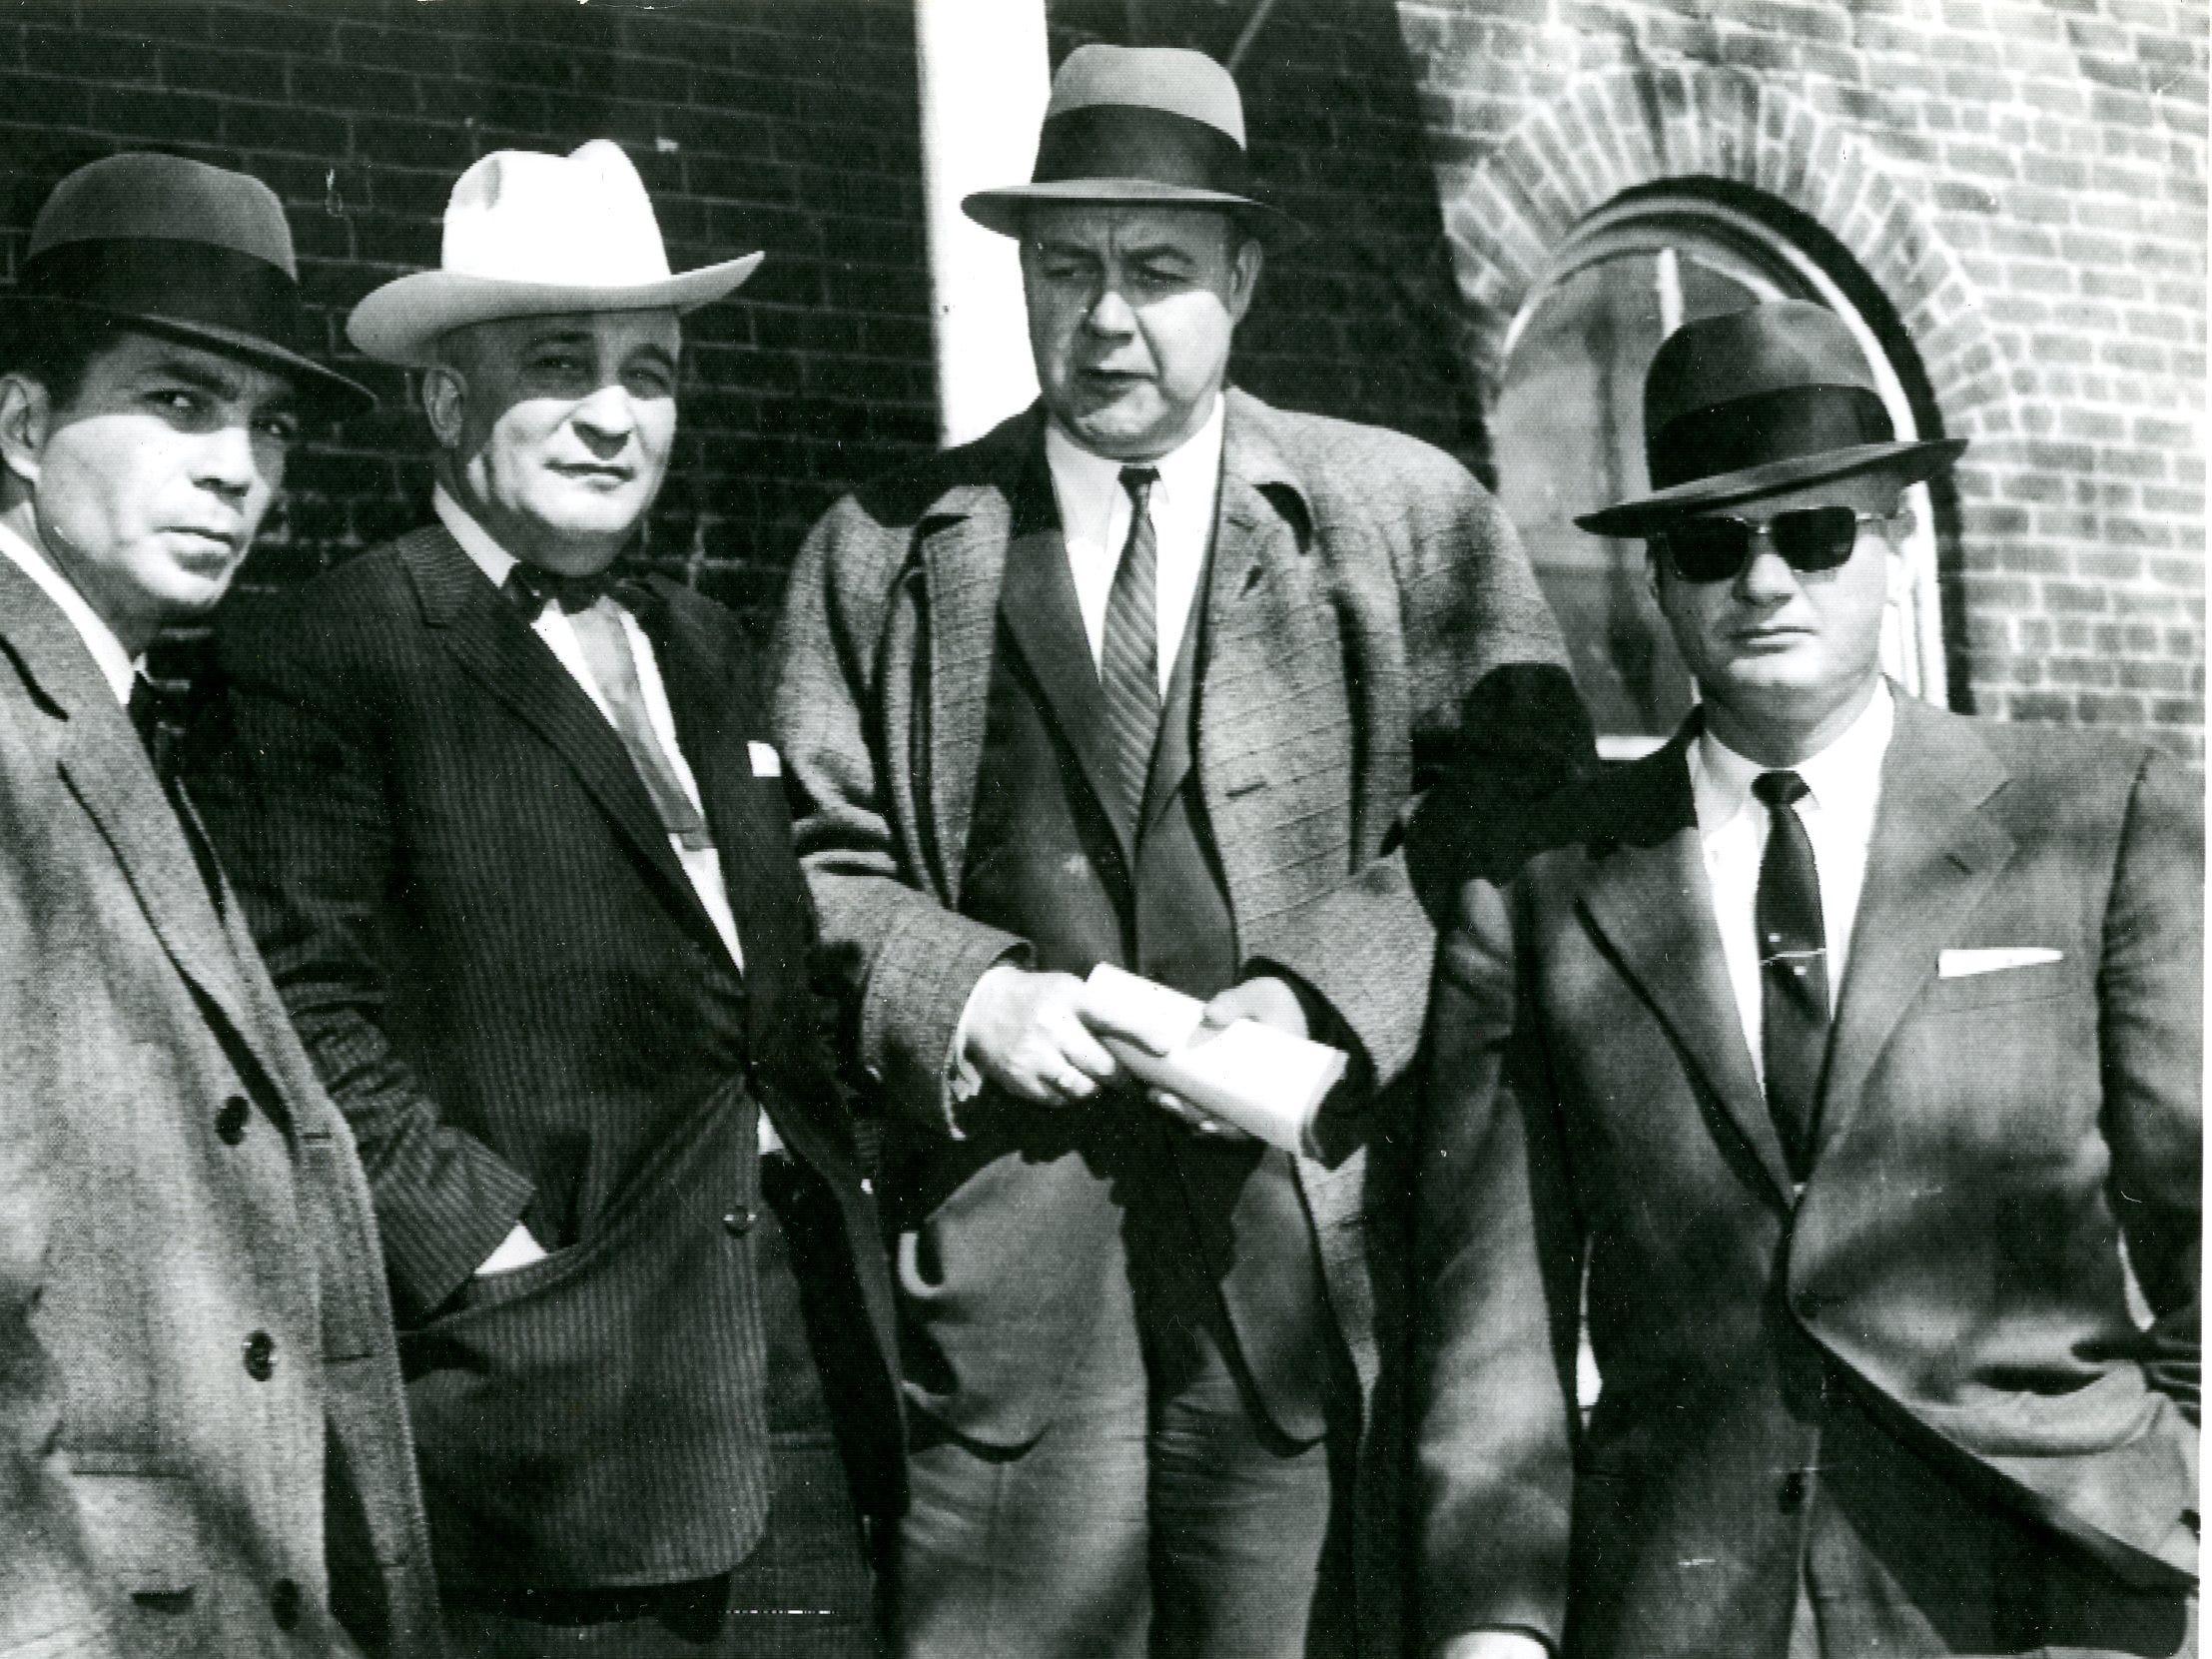 Members of the investigating committee outside the county building at Tracy City, February 21, 1959. Rep. J. Alan Hanover (Memphis), Senator Barton Dement (Murfreesboro), Rep. Harry Lee Senter (Bristol), and Senator Lawrence T. Hughes (Memphis).